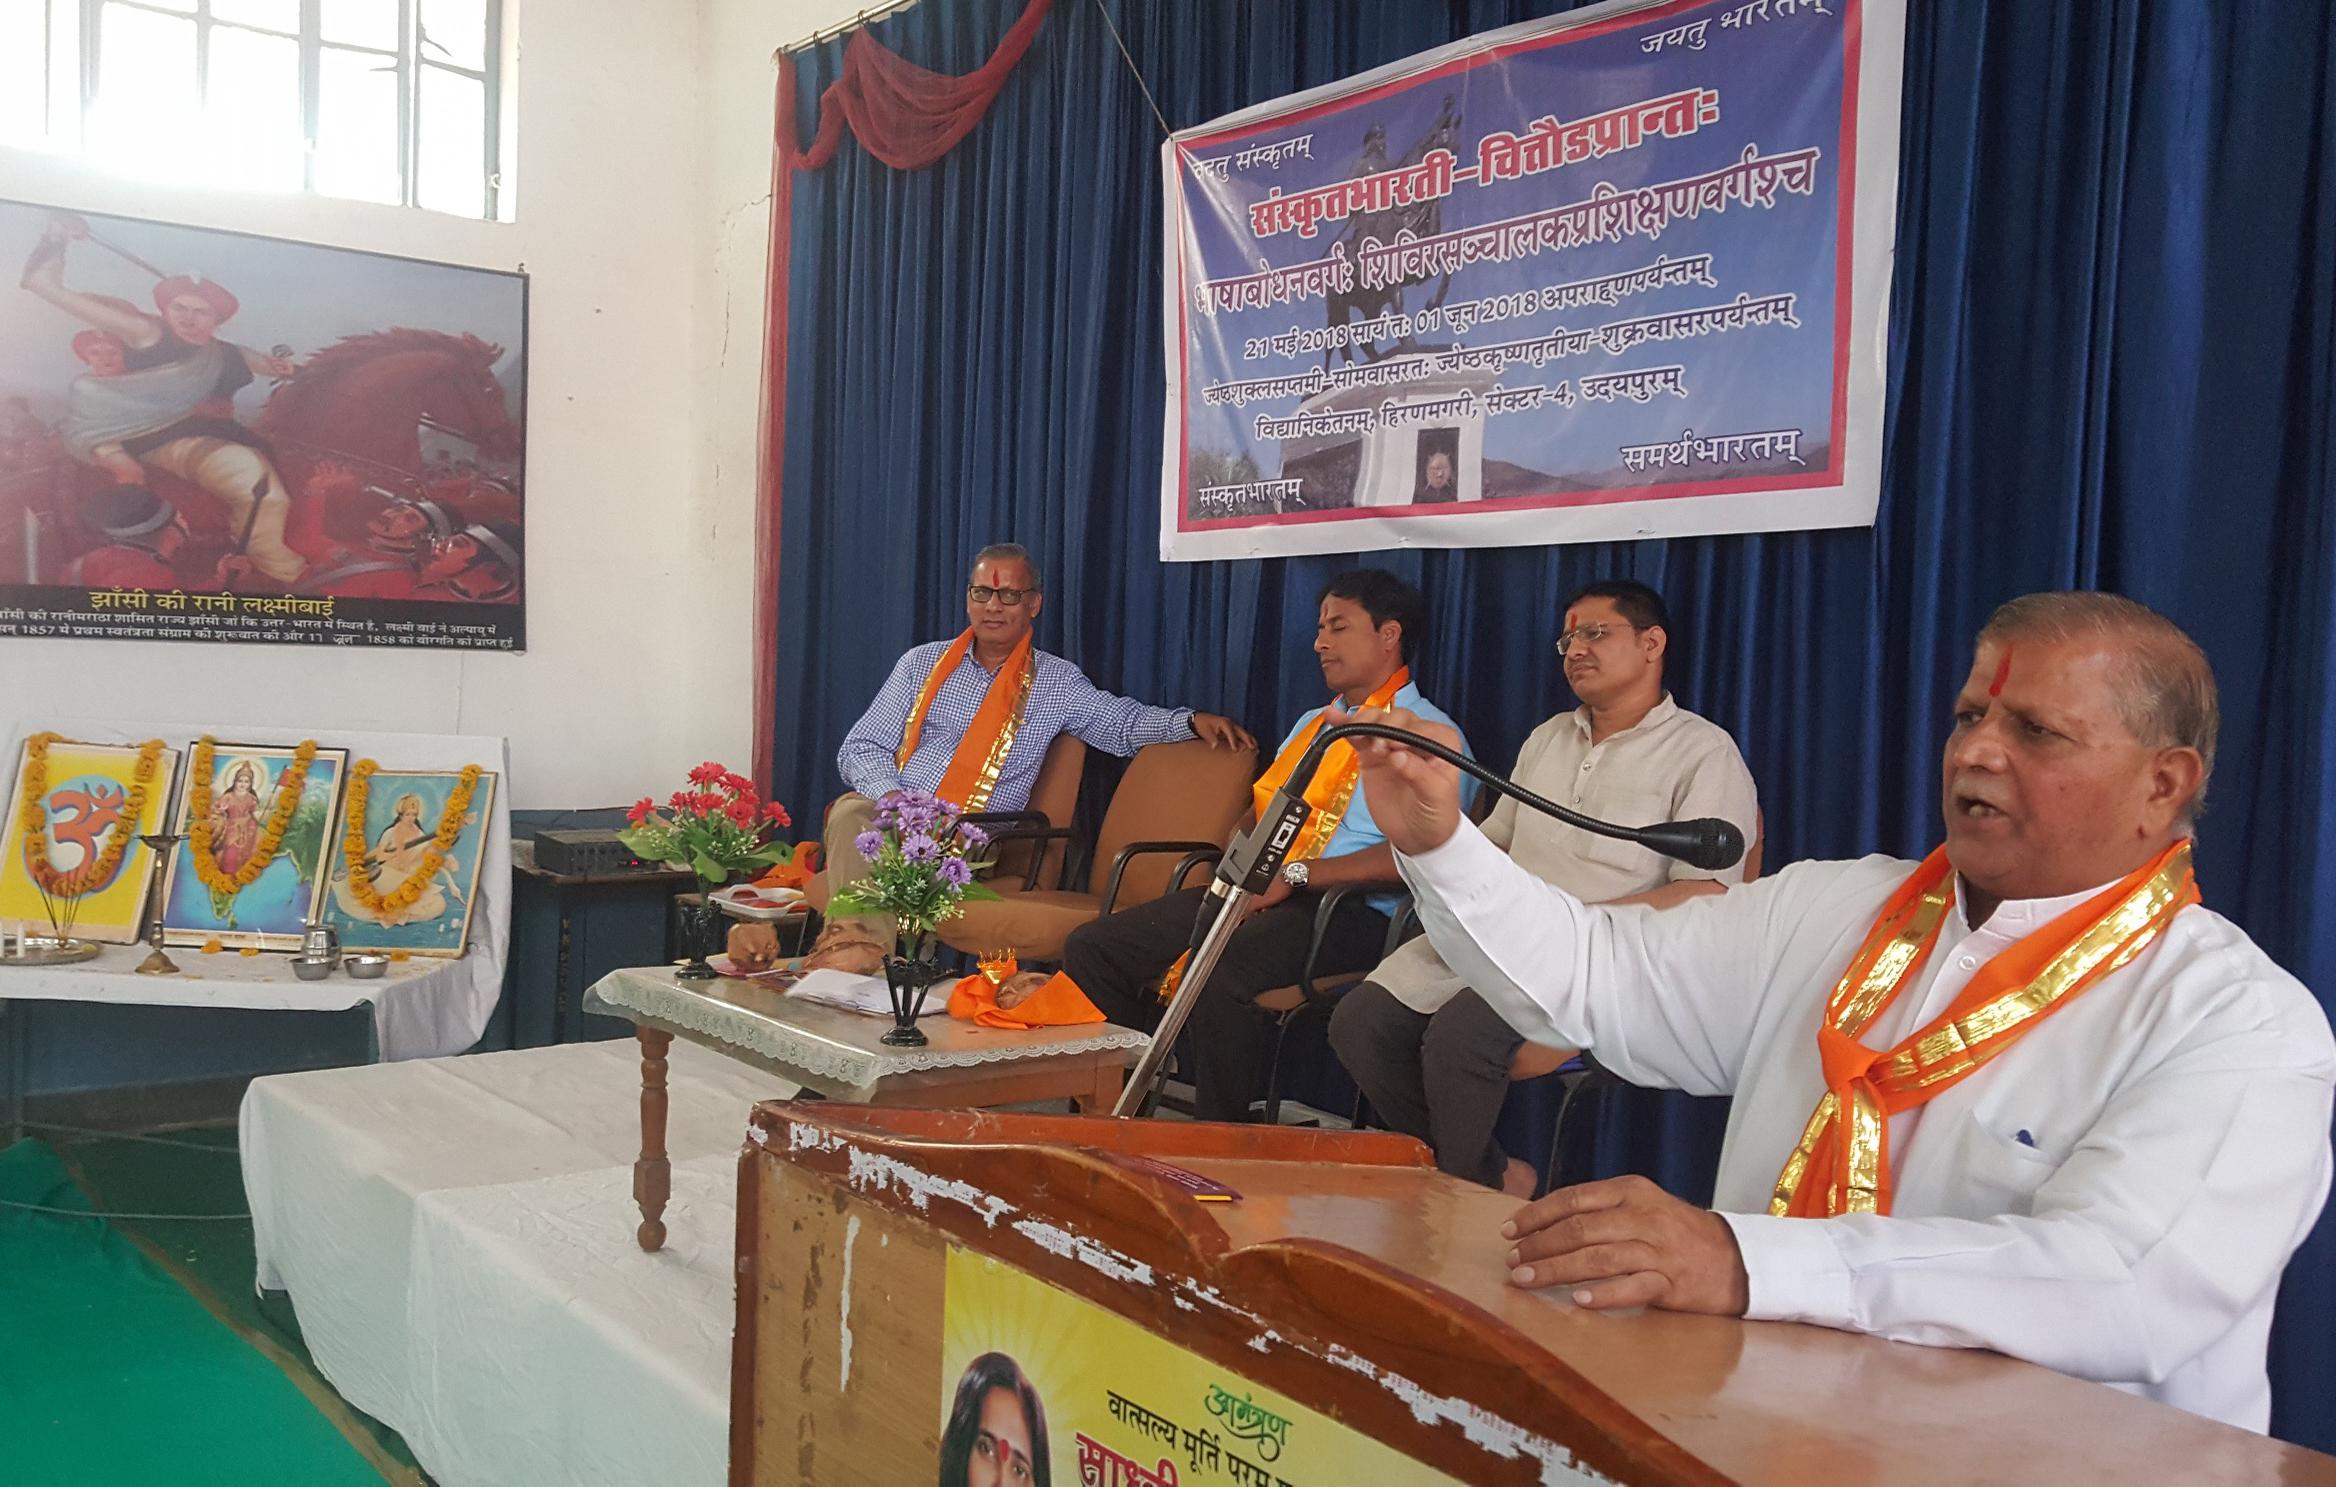 संस्कृत संभाषण आवासीय प्रशिक्षण वर्ग का उद्घाटन